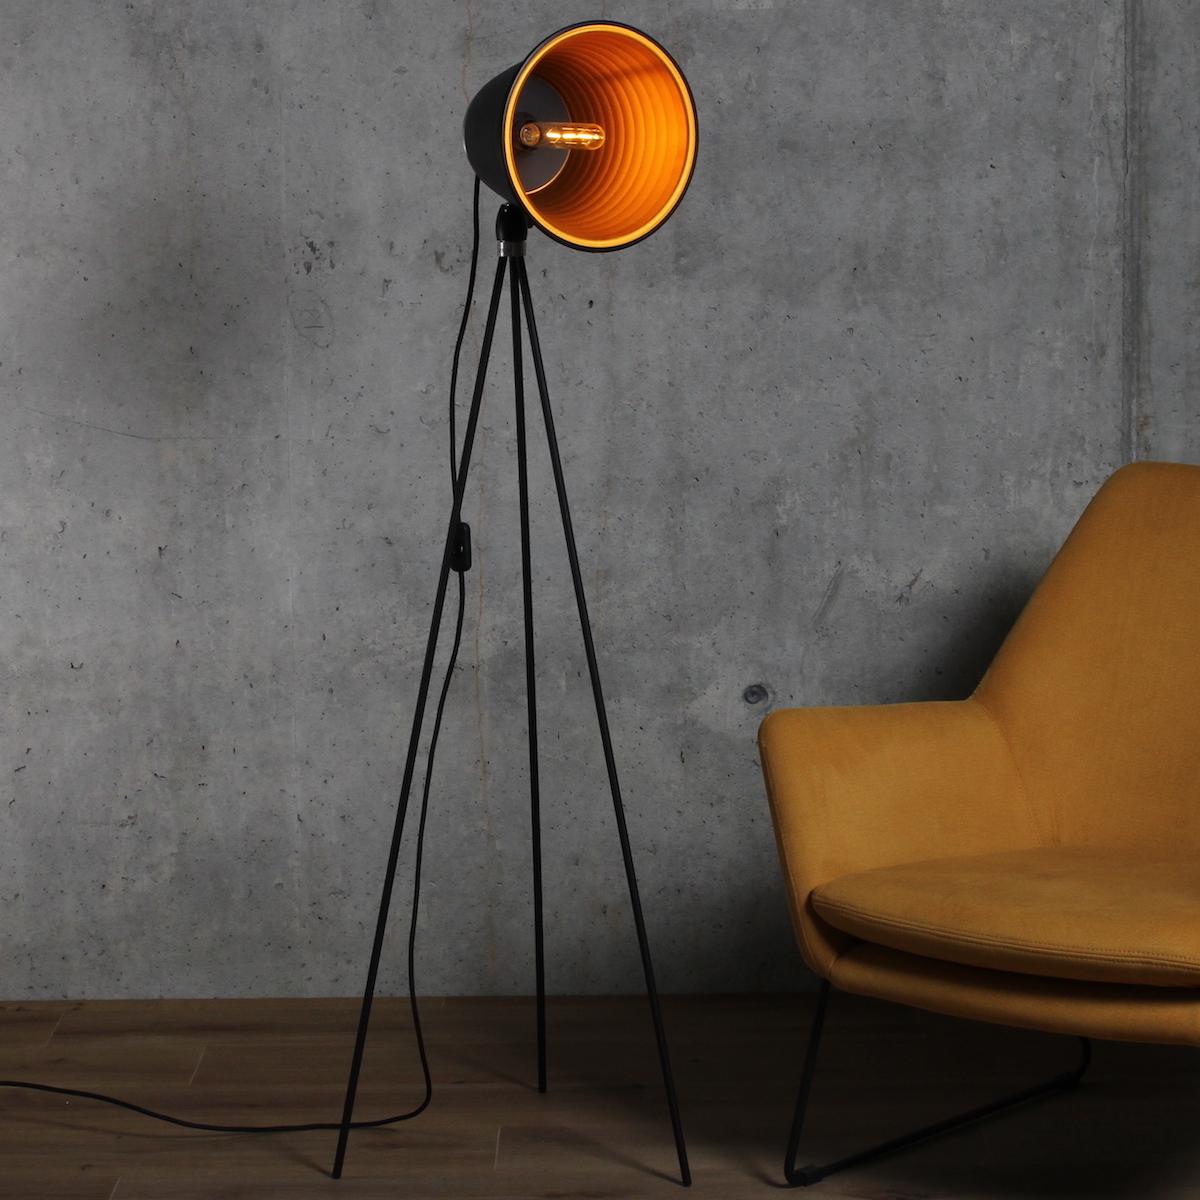 kovova-stojaci-lampa-taboo-zlatá-uvod